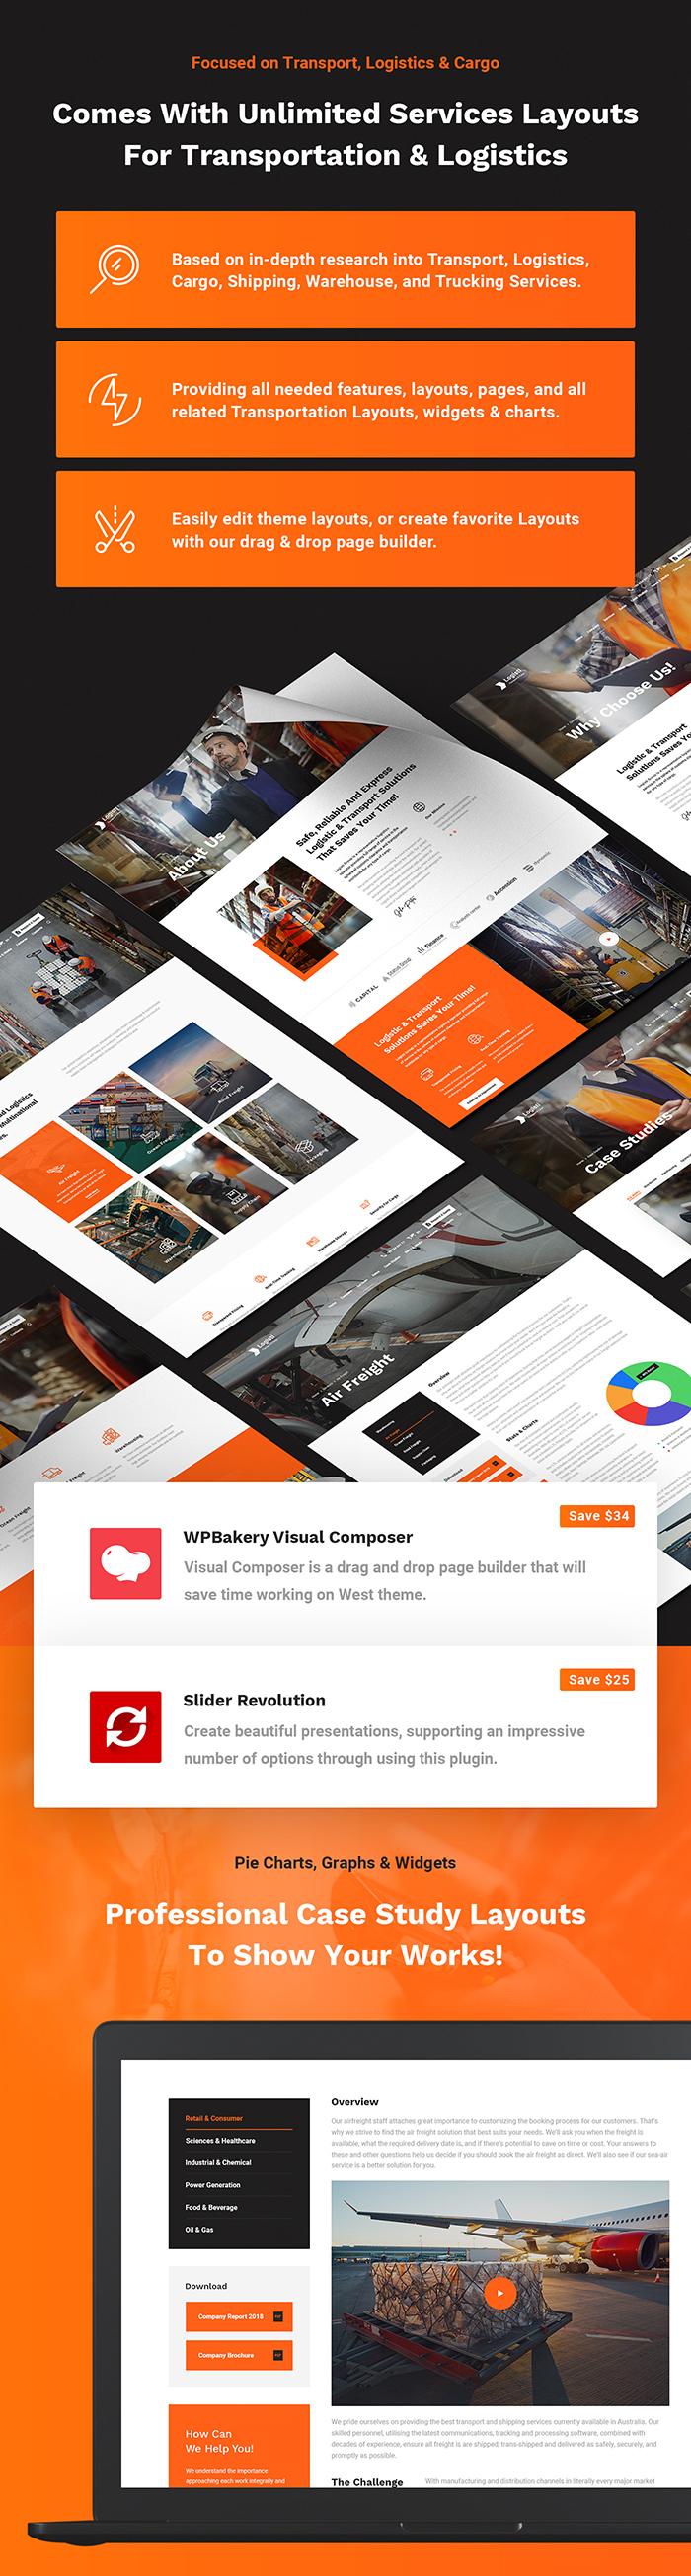 Logisti - Logistics & Transport WordPress Theme - 7